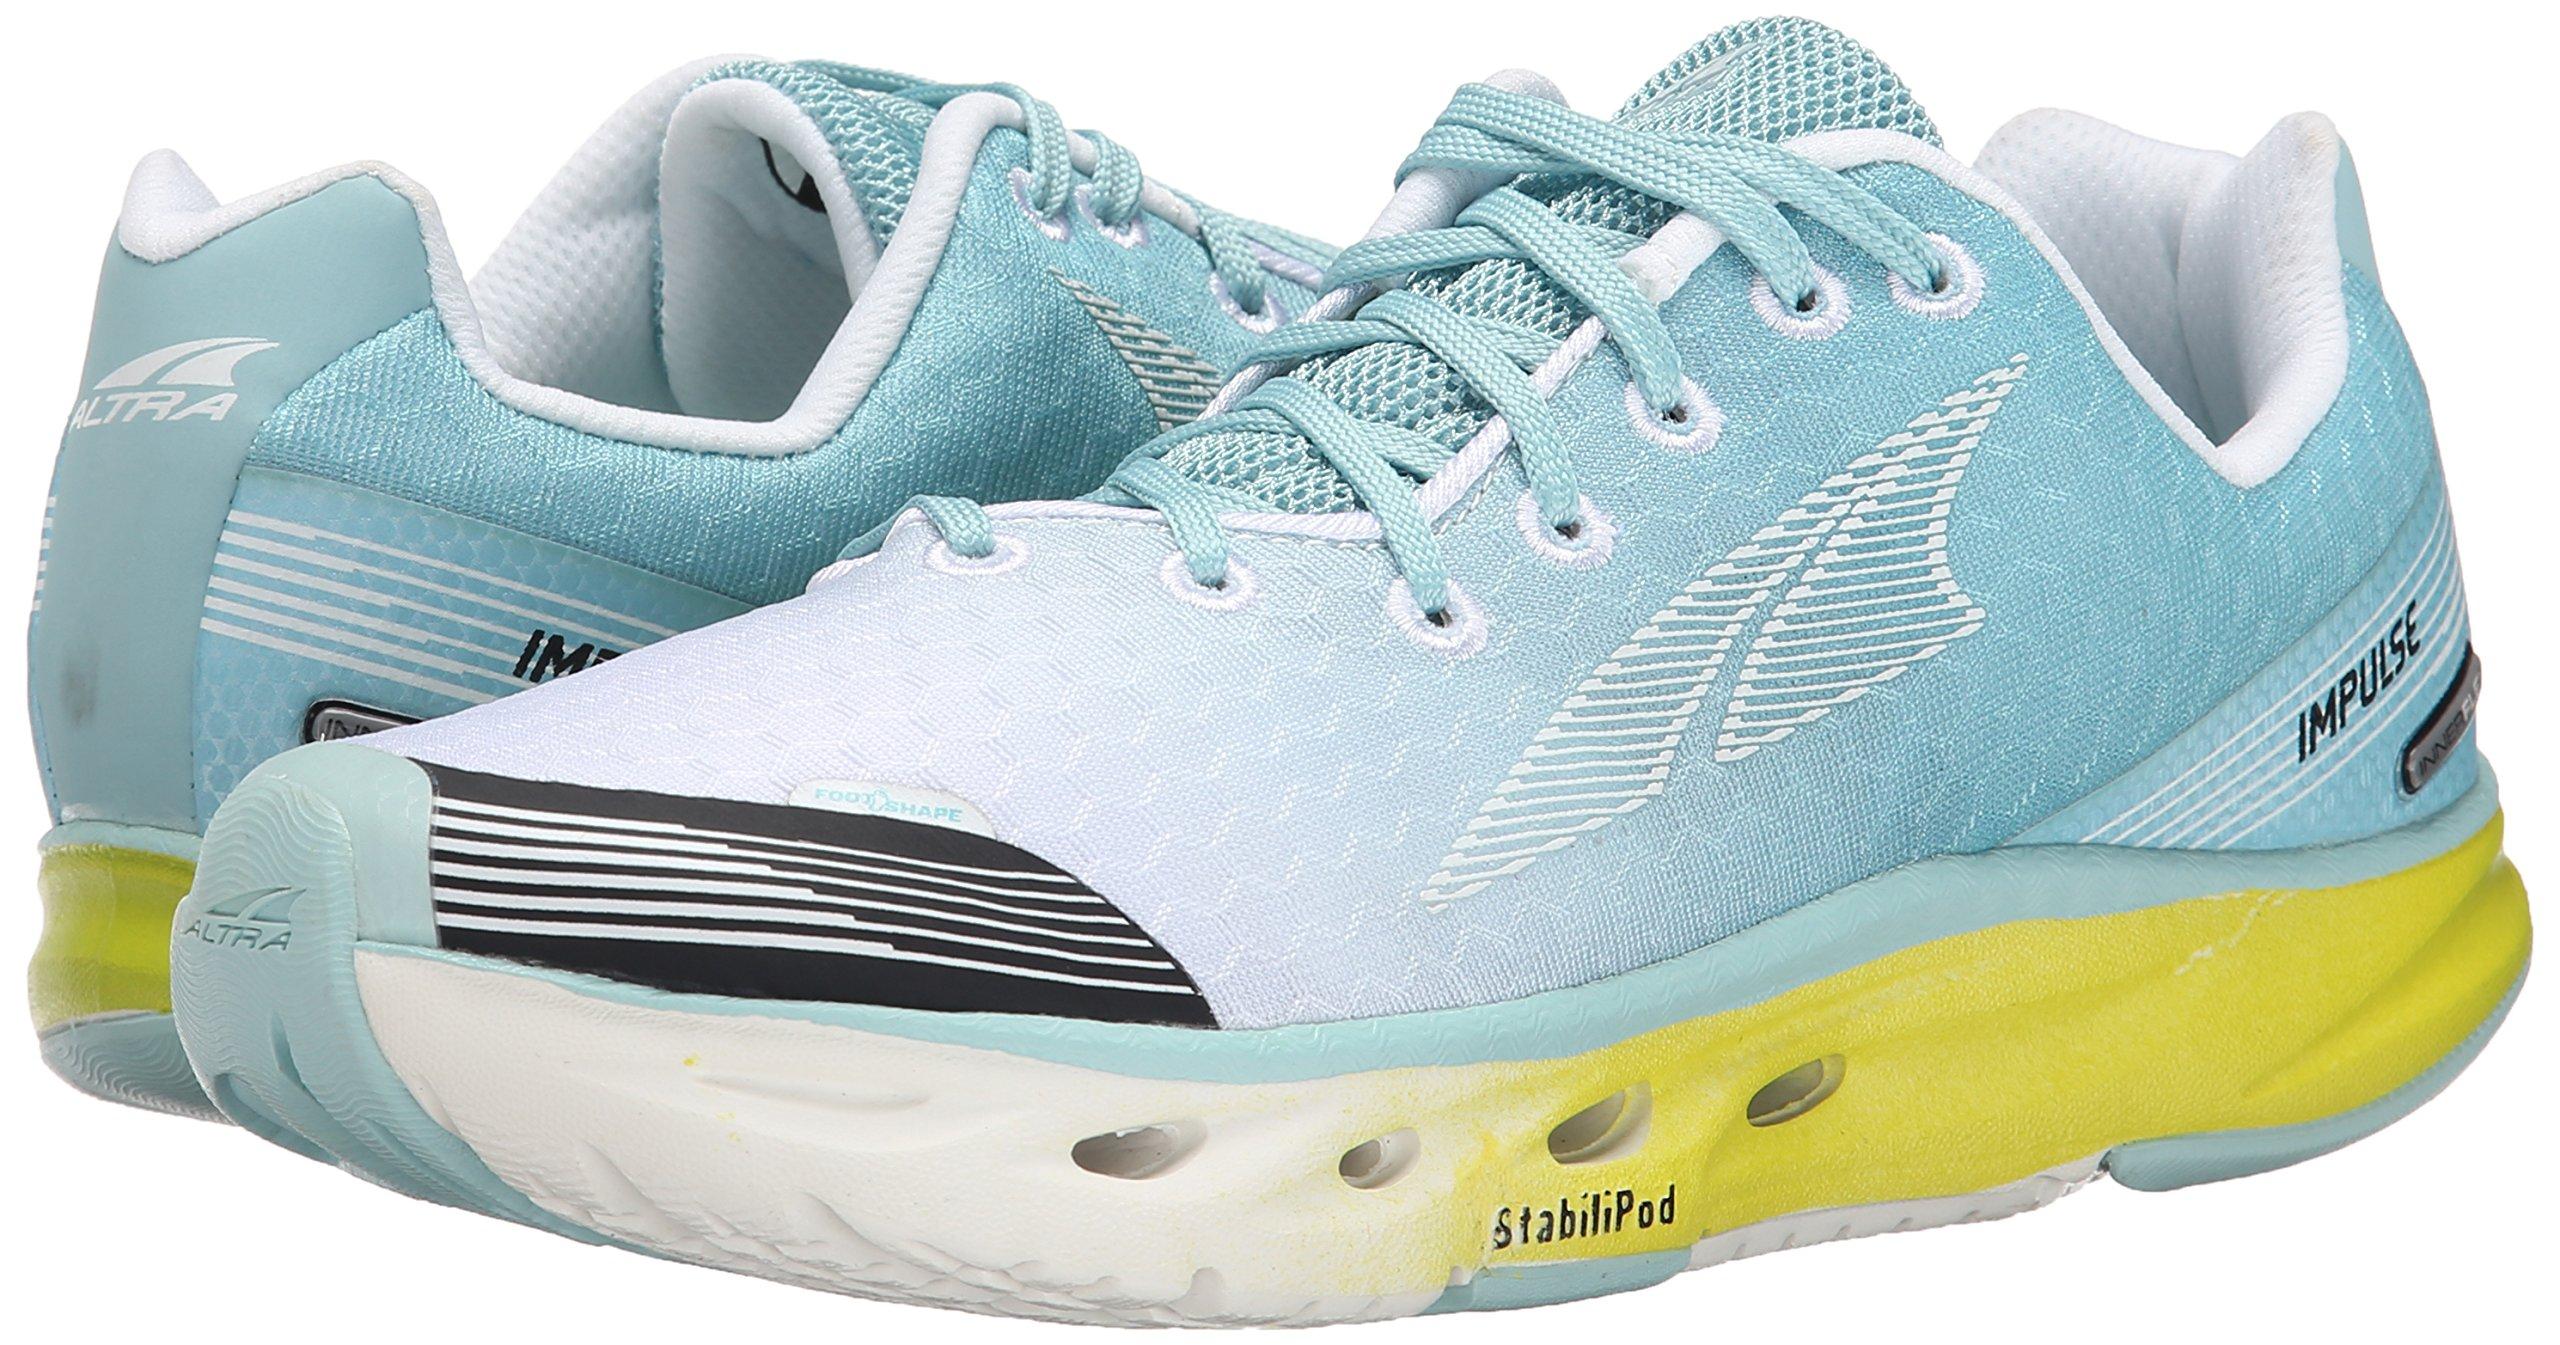 91RbhutR2CL - Altra Women's Impulse Running Shoe